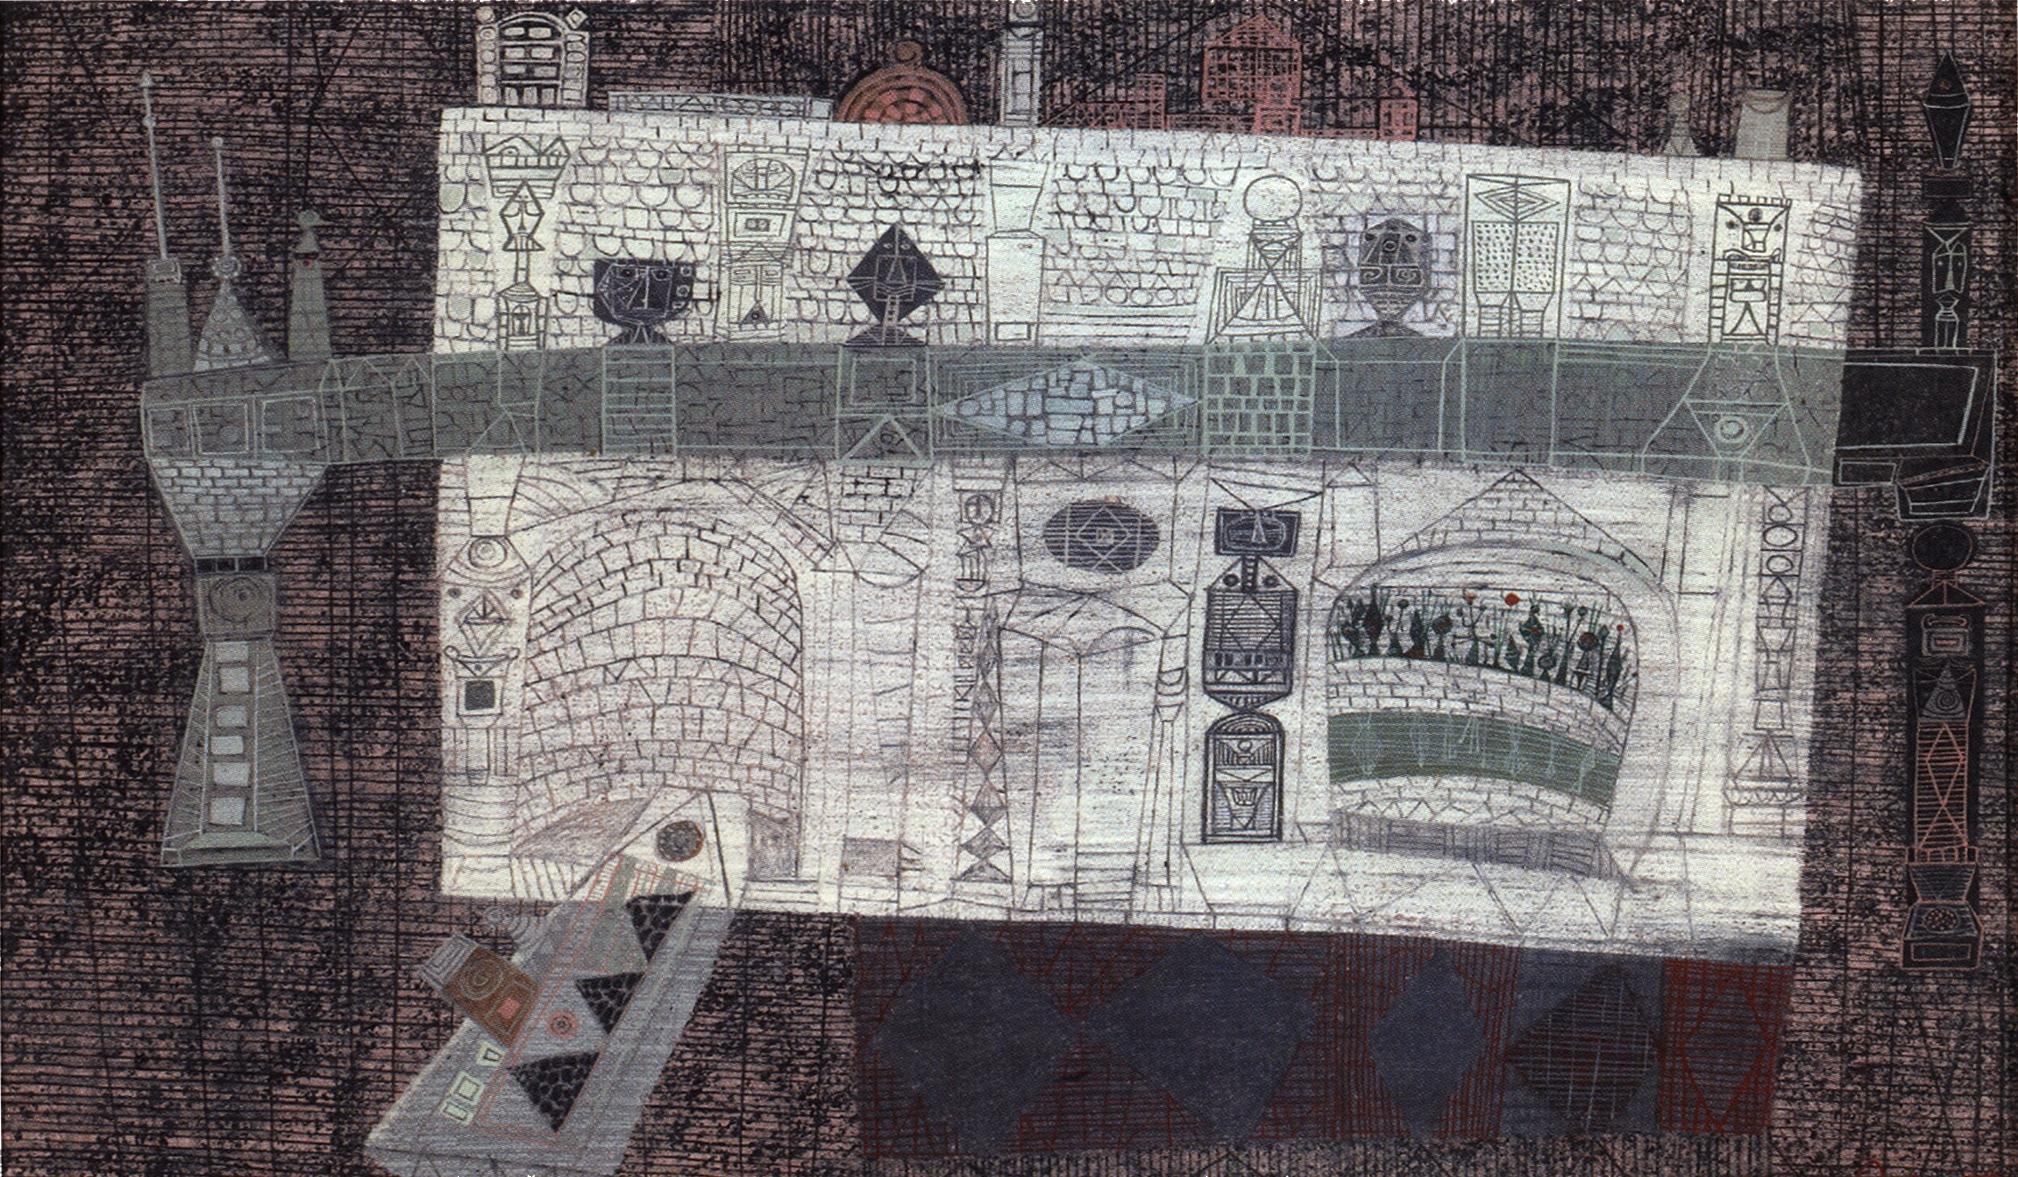 Bridge of Faces , circa 1950  mixed media on paper  14 1/2 x 21 inches; 36.8 x 53.3 centimeters